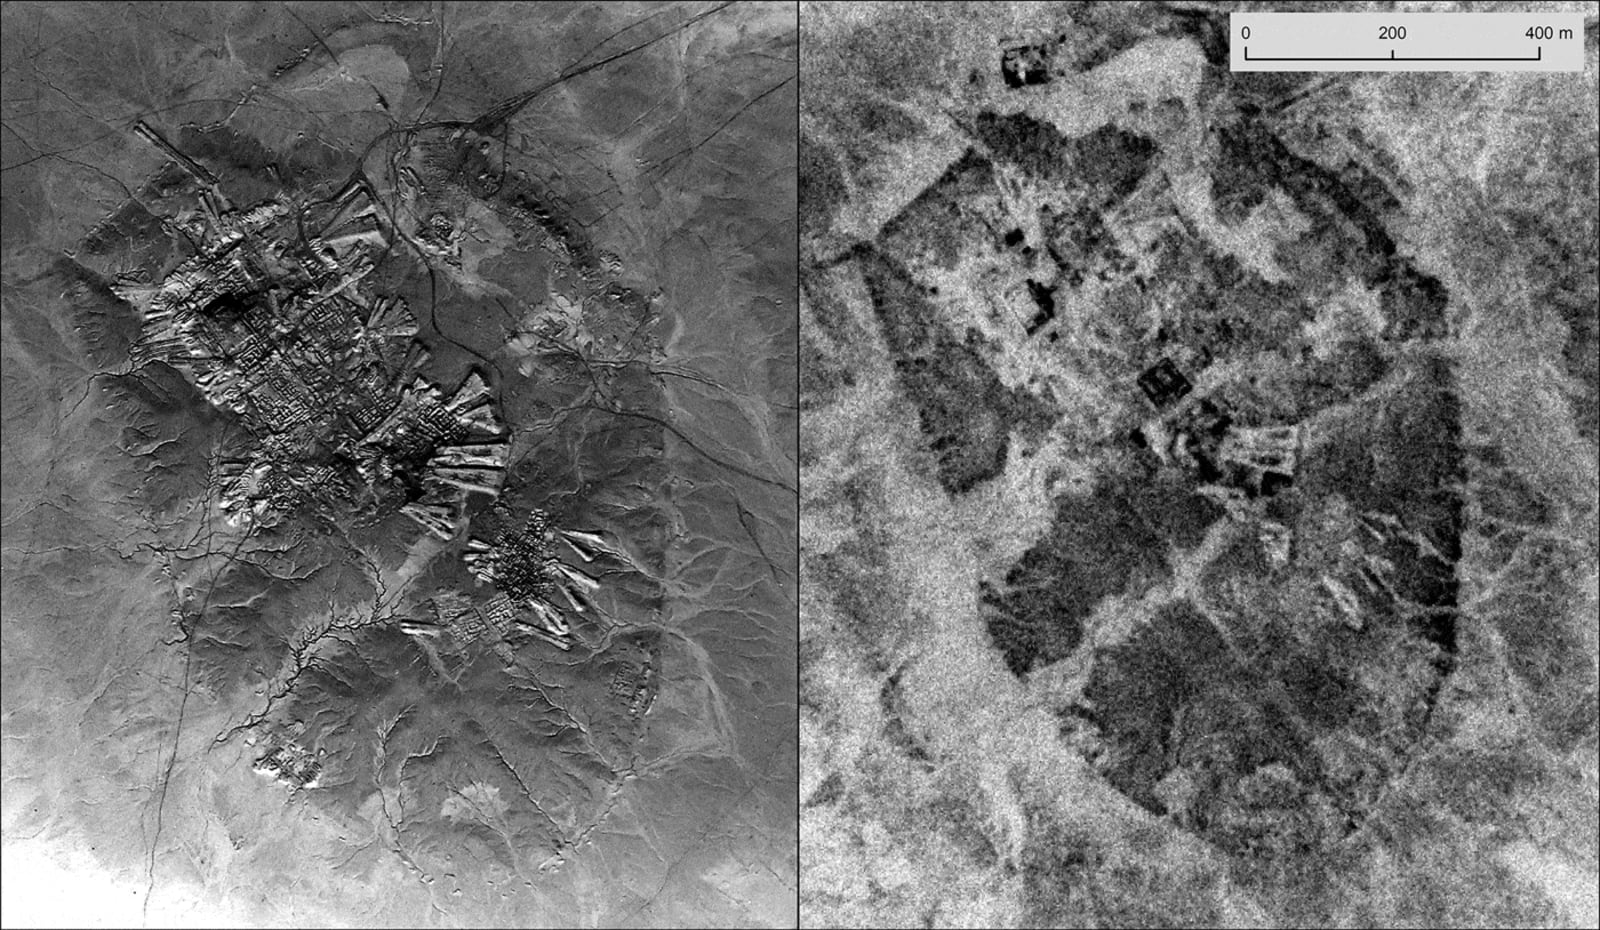 U-2 aerial image compared a Corona satellite